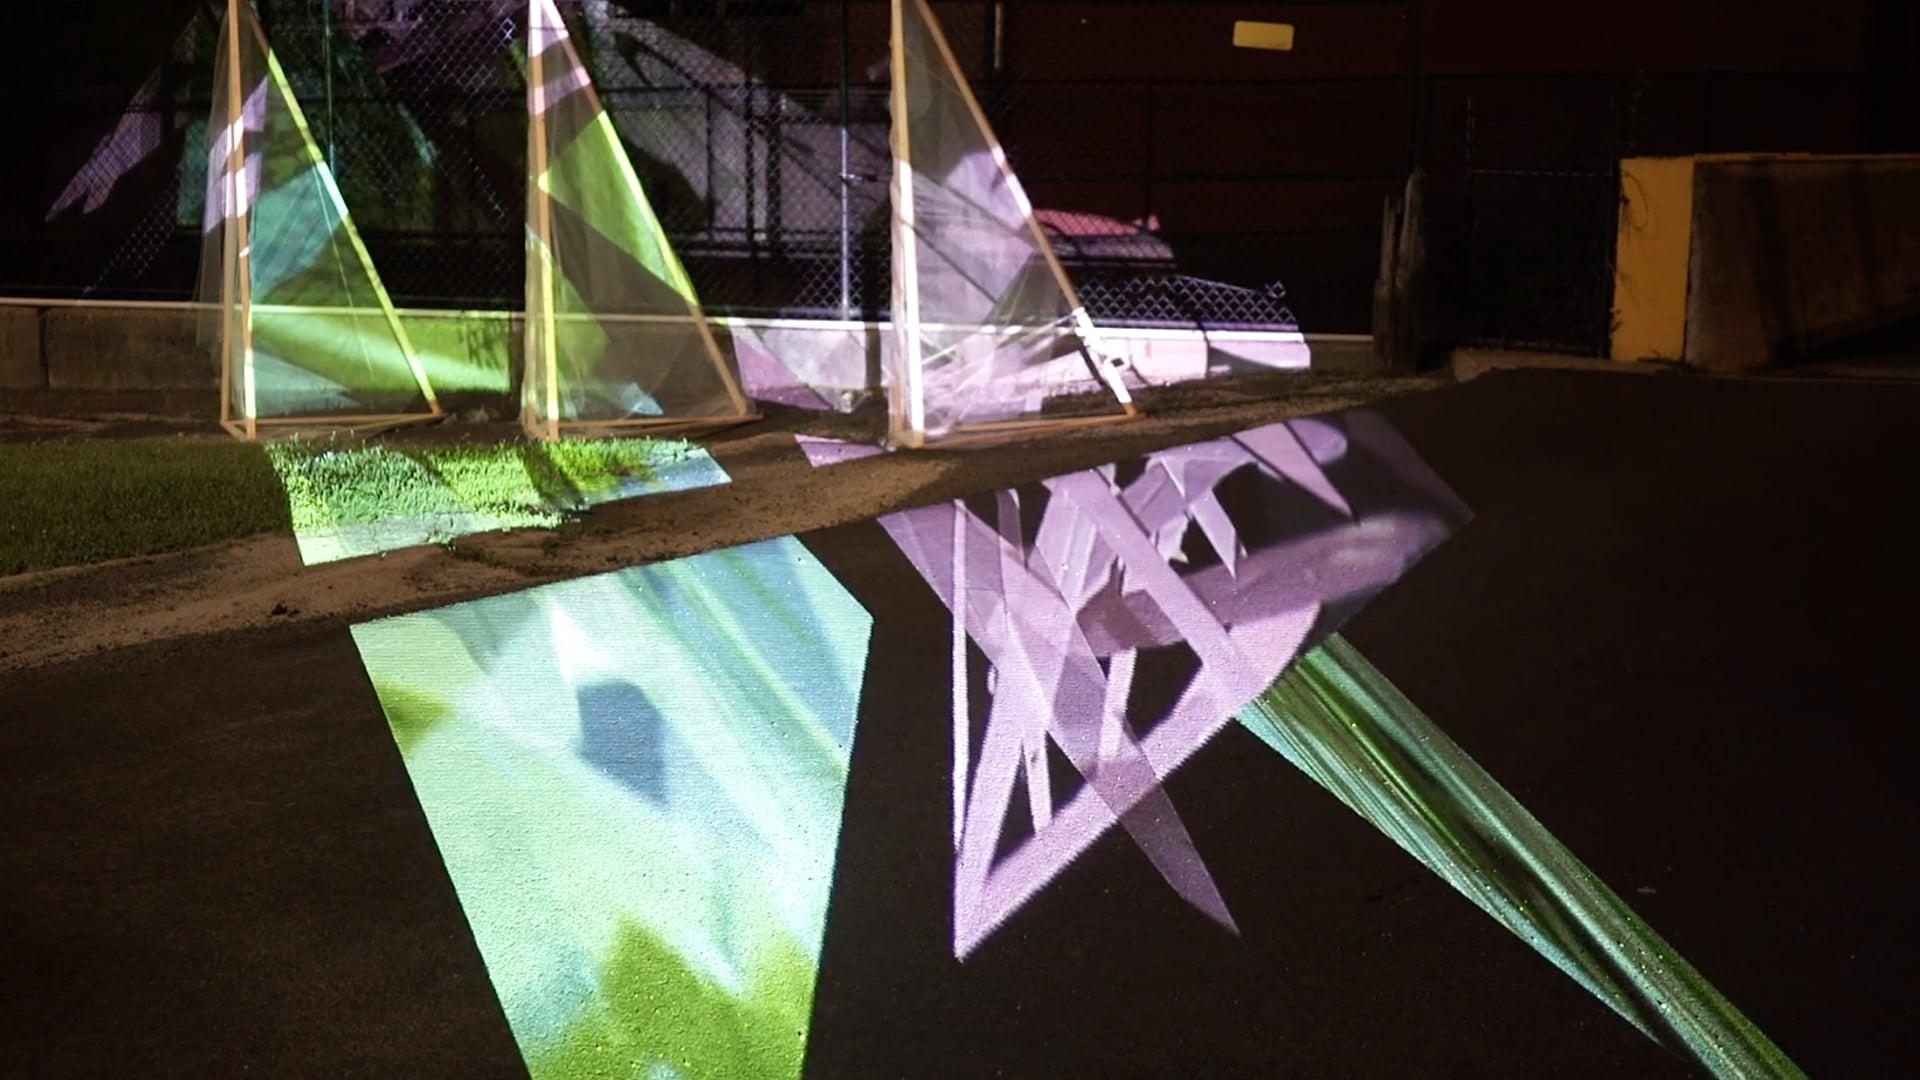 Test installations document video, The Studio at MASS MoCA